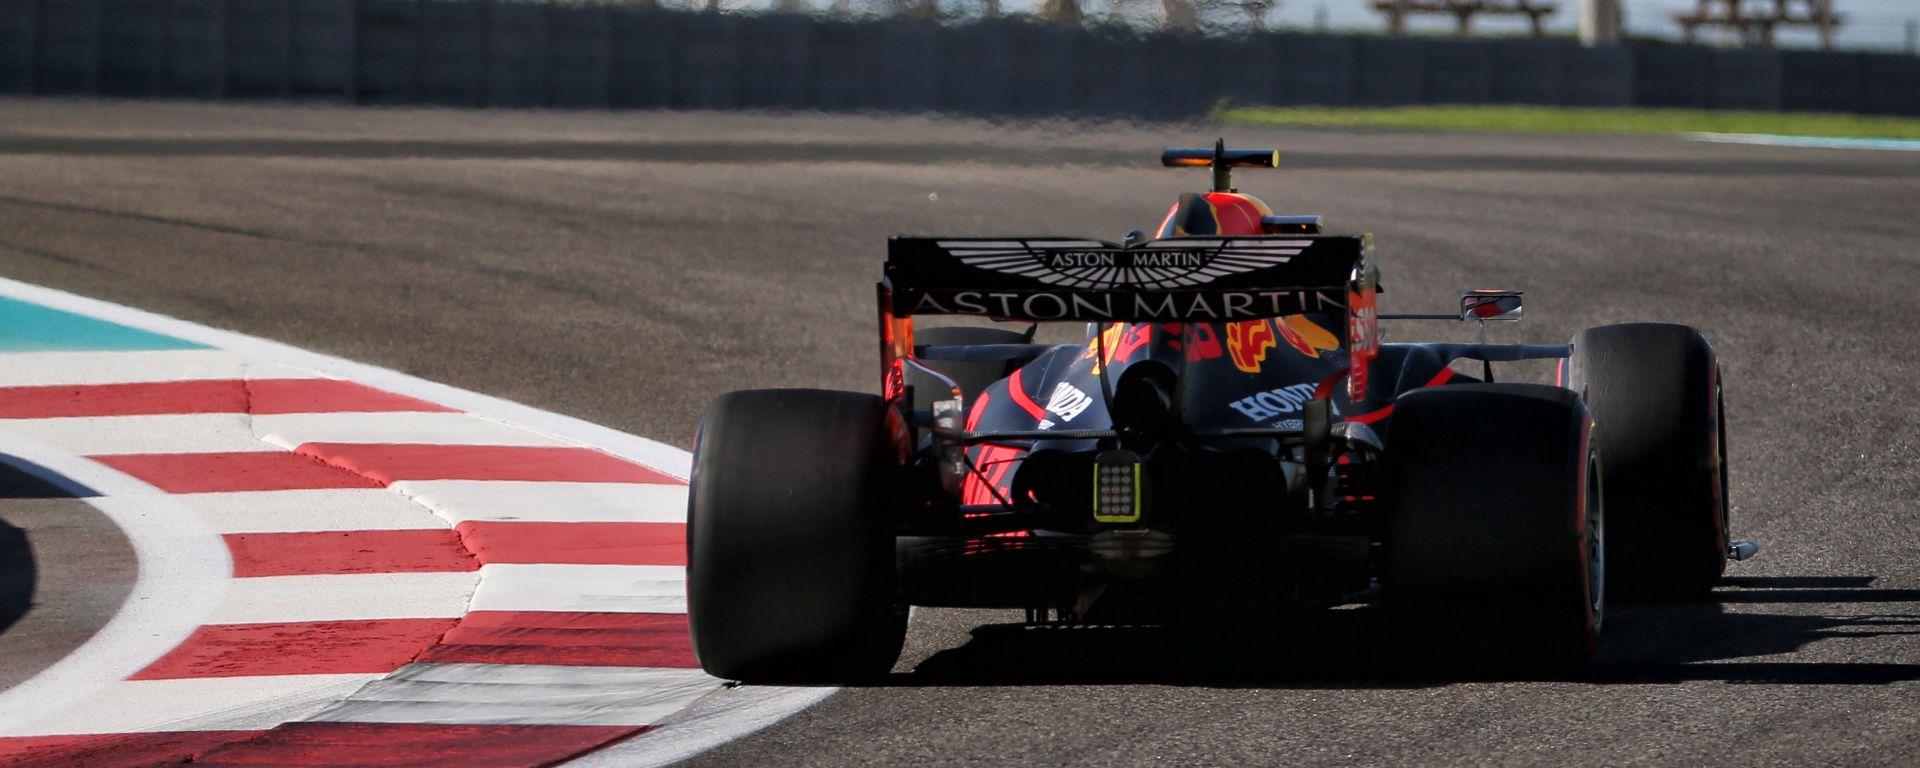 F1 GP Abu Dhabi 2020, Yas Marina: Max Verstappen (Red Bull Racing)